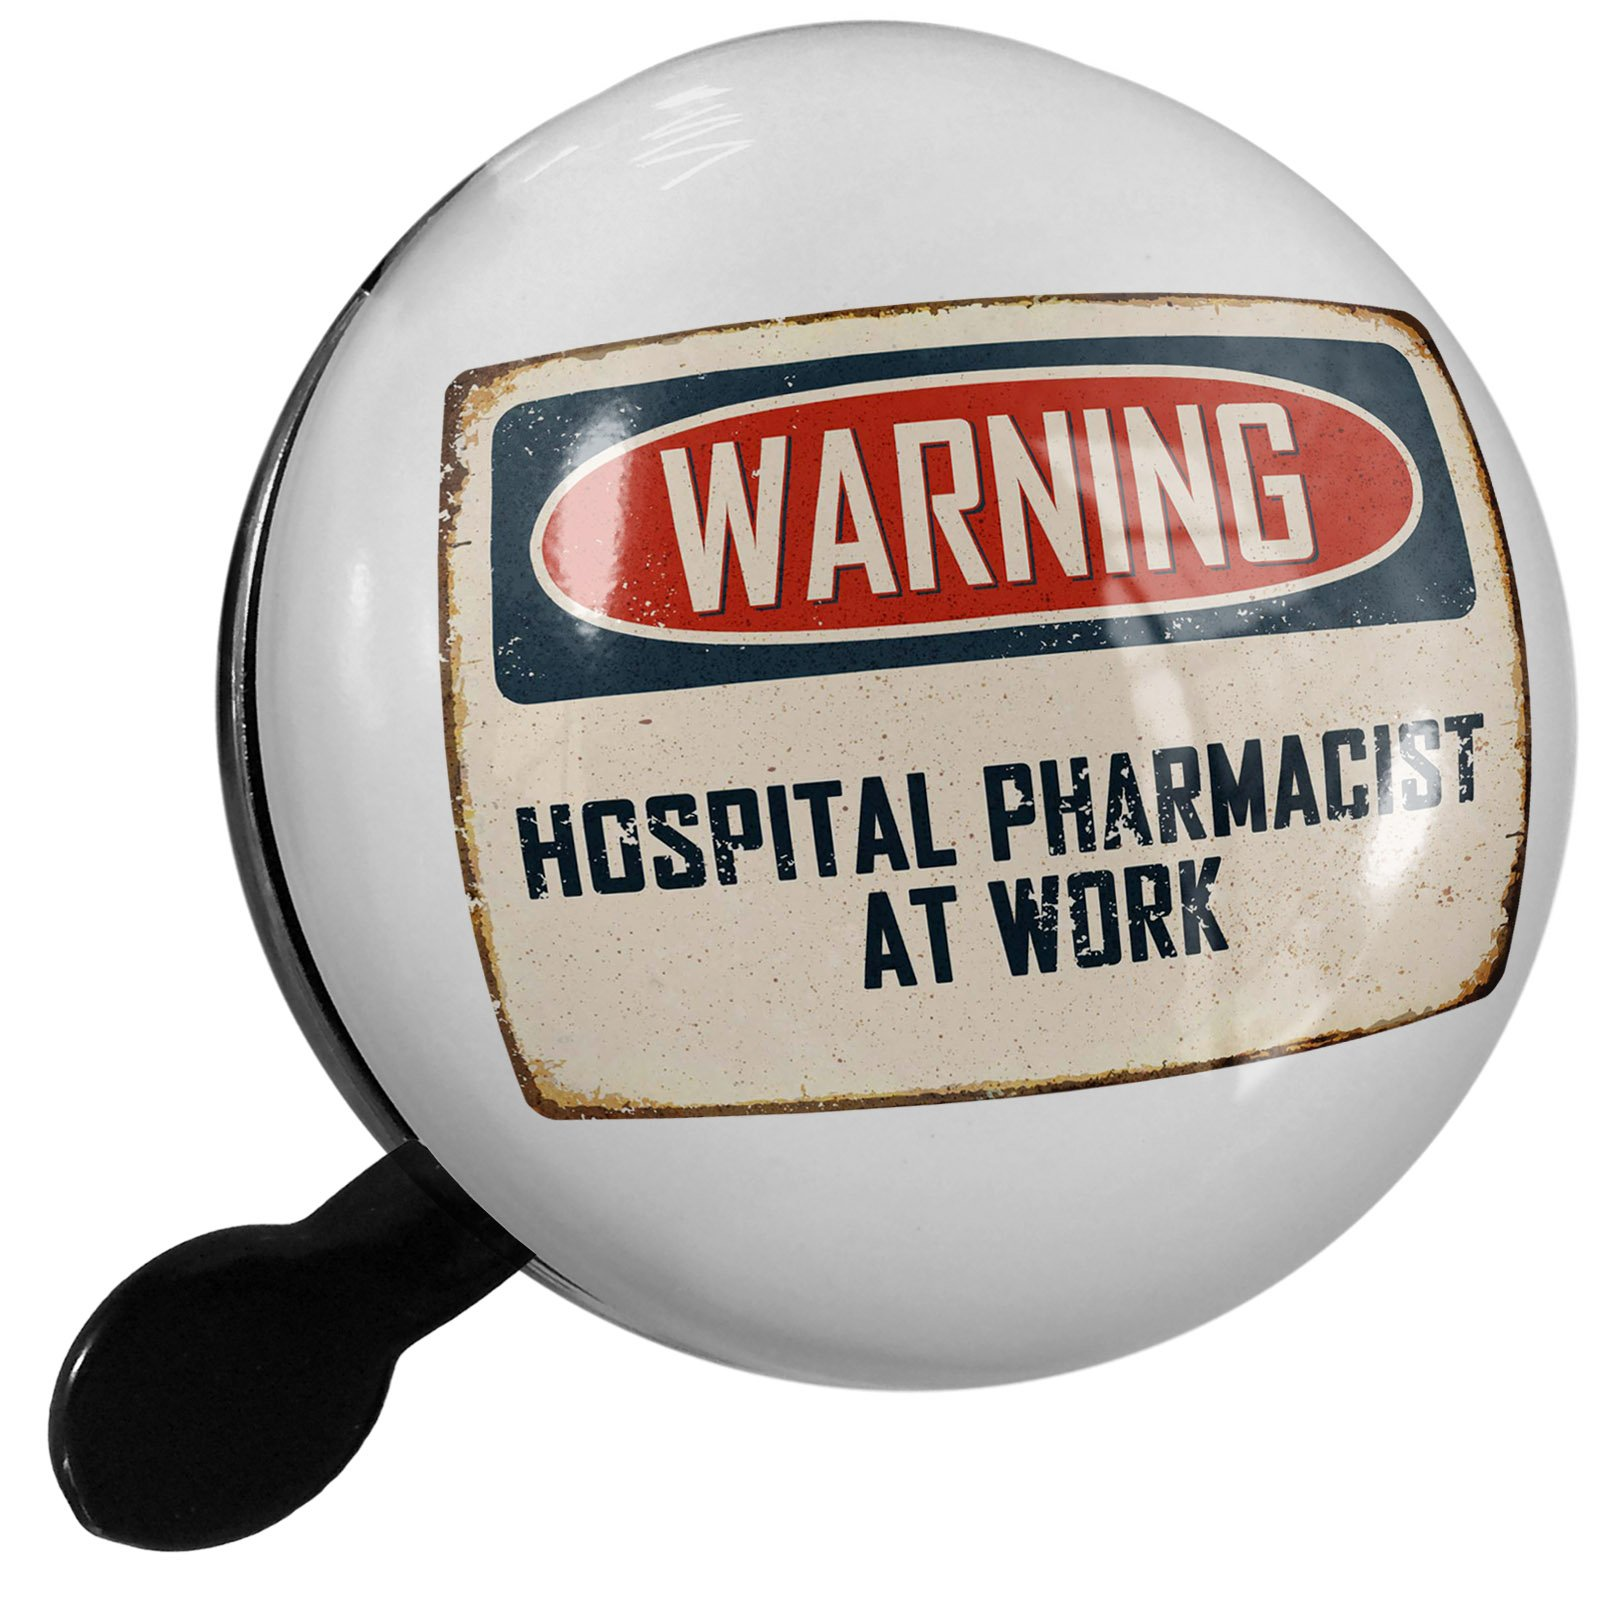 Small Bike Bell Warning Hospital Pharmacist At Work Vintage Fun Job Sign - NEONBLOND